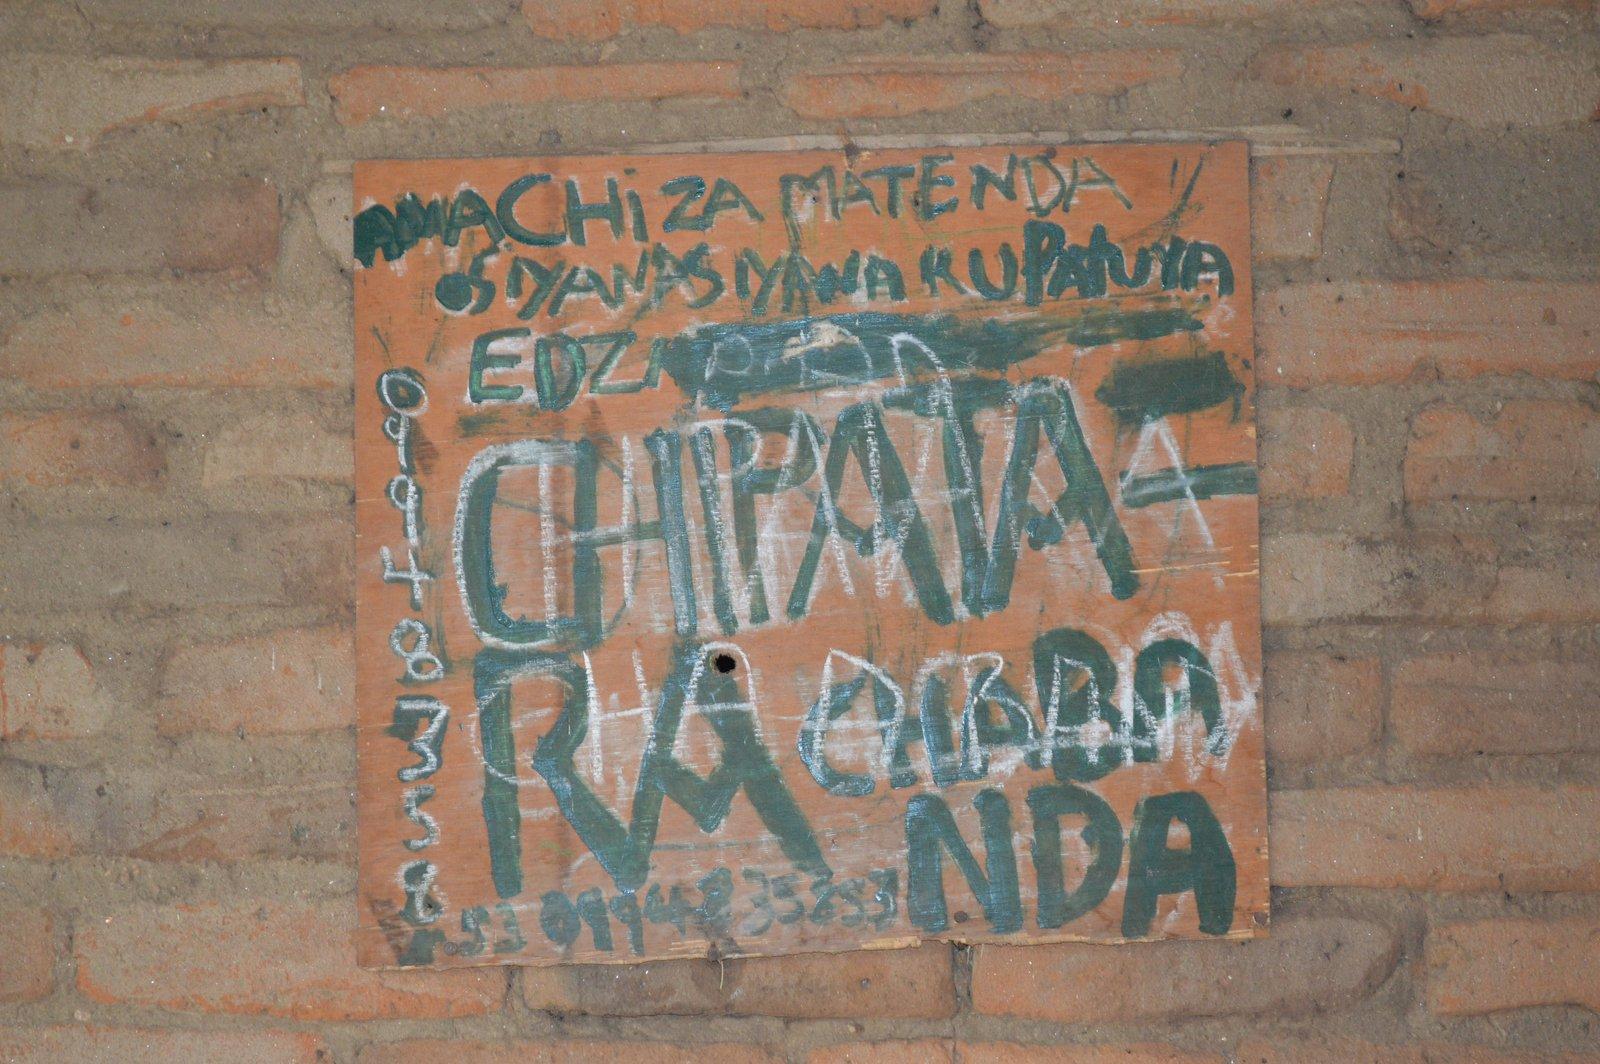 Chikasima, Nkhata Bay (23).JPG